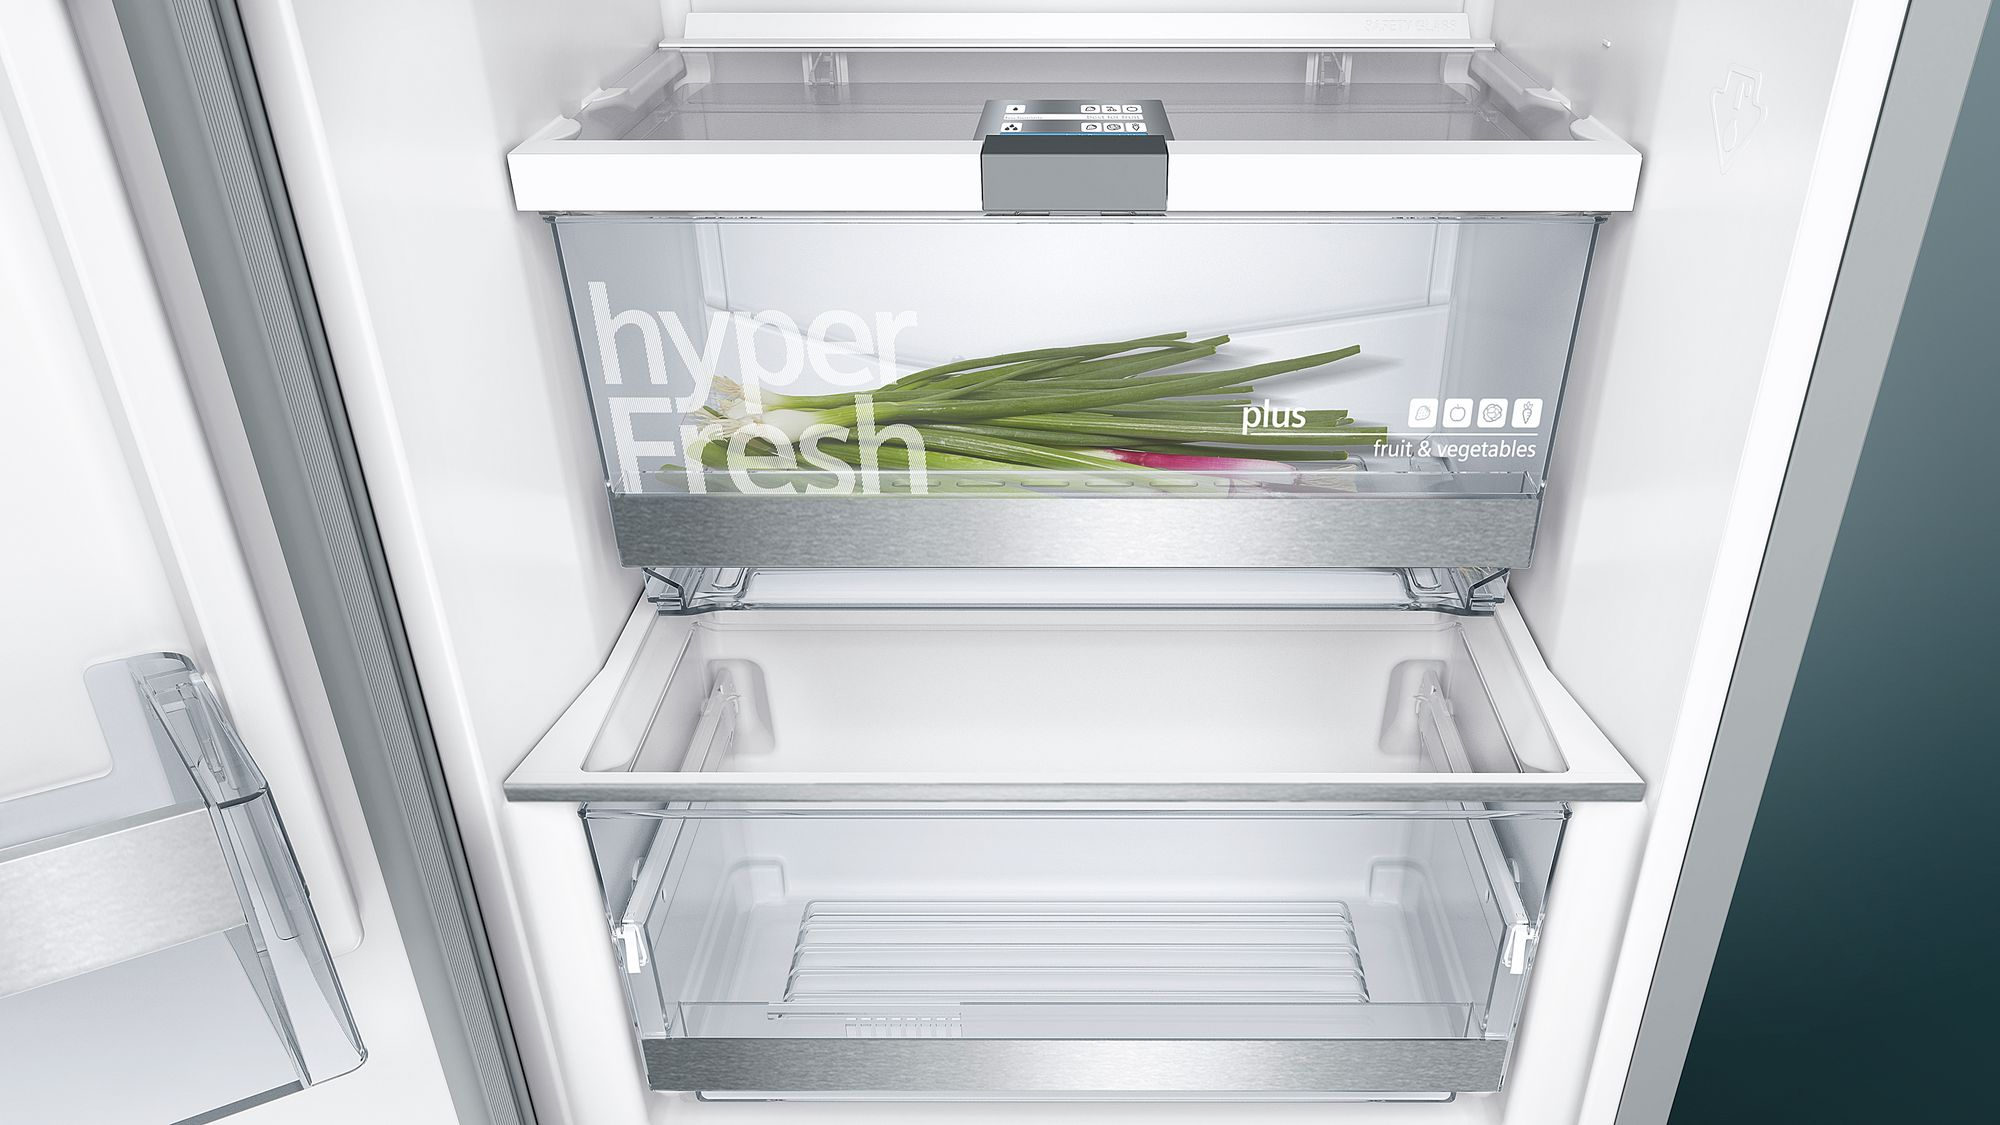 Siemens Kühlschrank Edelstahl : Siemens stand kühlschrank iq500 türen edelstahl antifingerprint